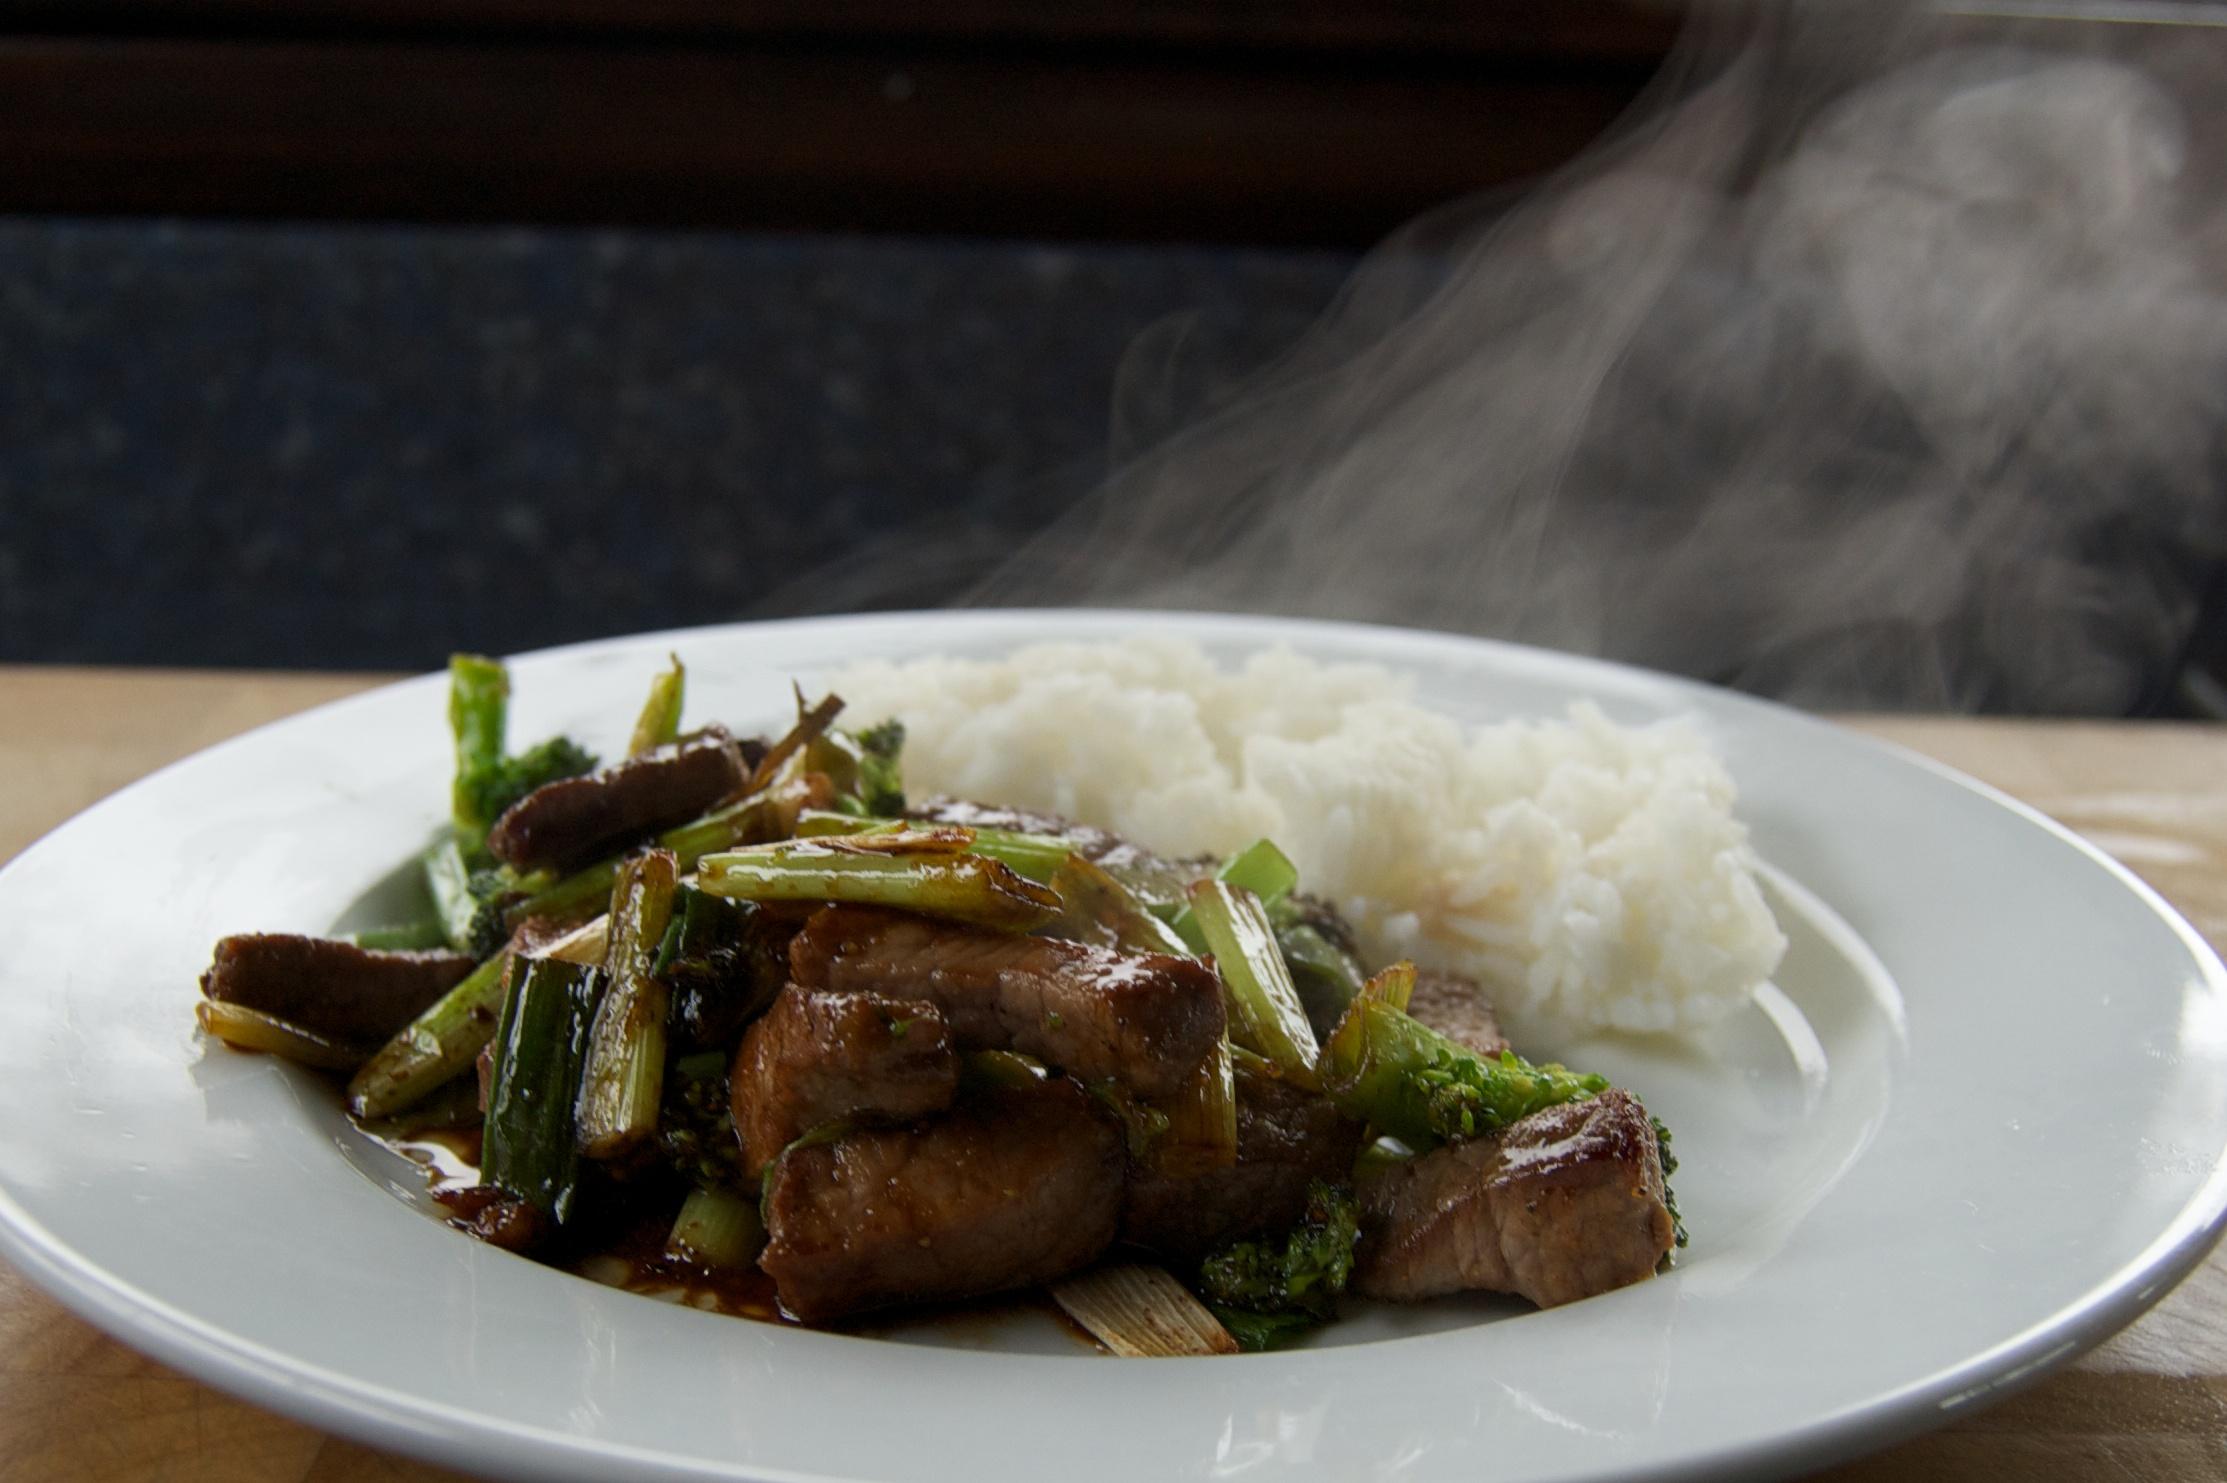 http://blog.rickk.com/food/2012/10/26/ate.2012.10.25.l.jpg